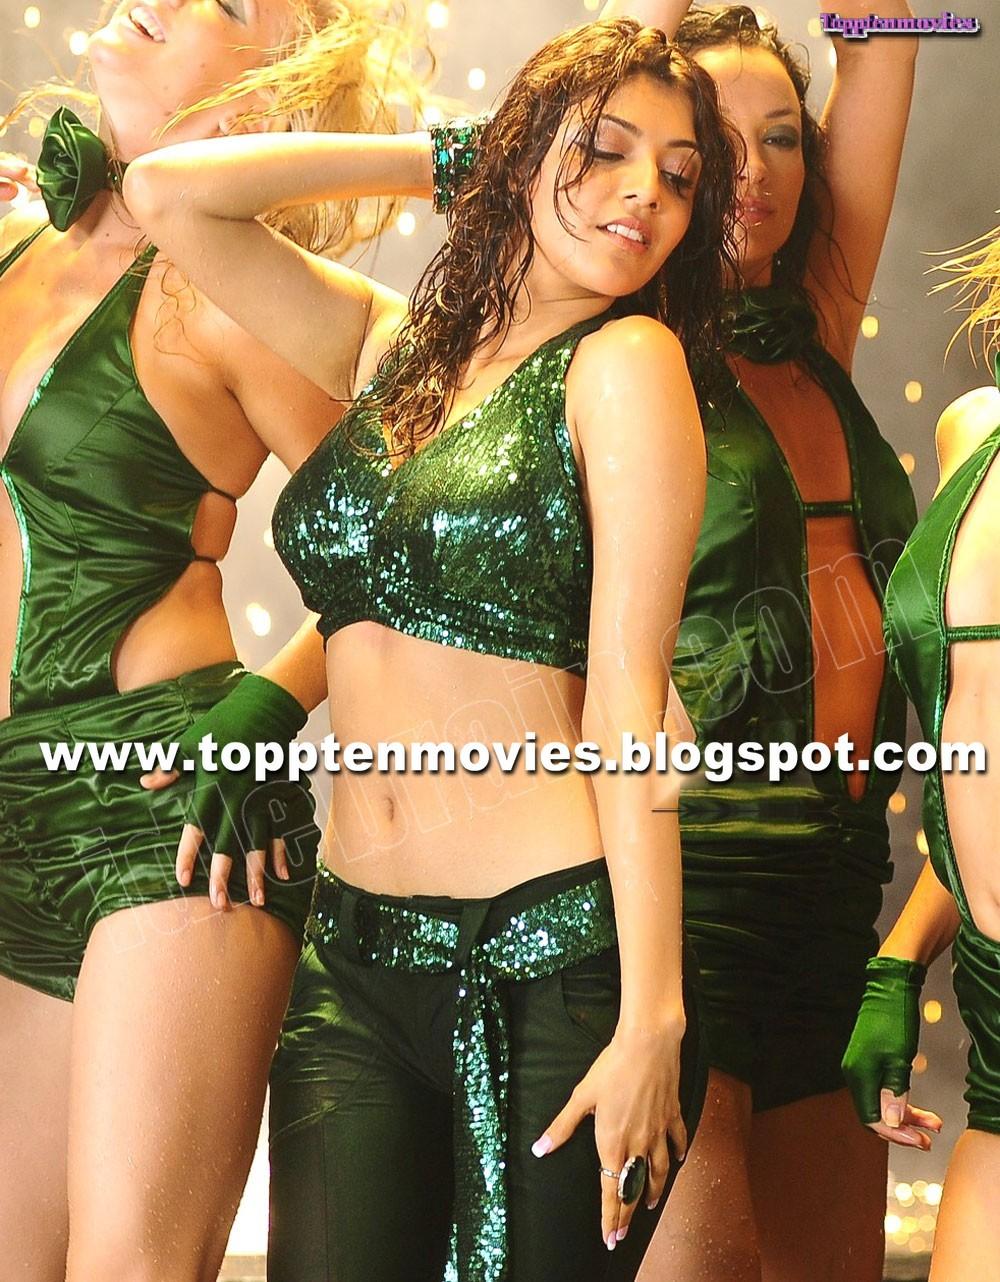 http://3.bp.blogspot.com/_iRqKBCtH6ZM/S_tyW-iuorI/AAAAAAAACHQ/_DjNPF-AmlQ/s1600/KajalAgarwal-Sexy-Navel-Show.jpg